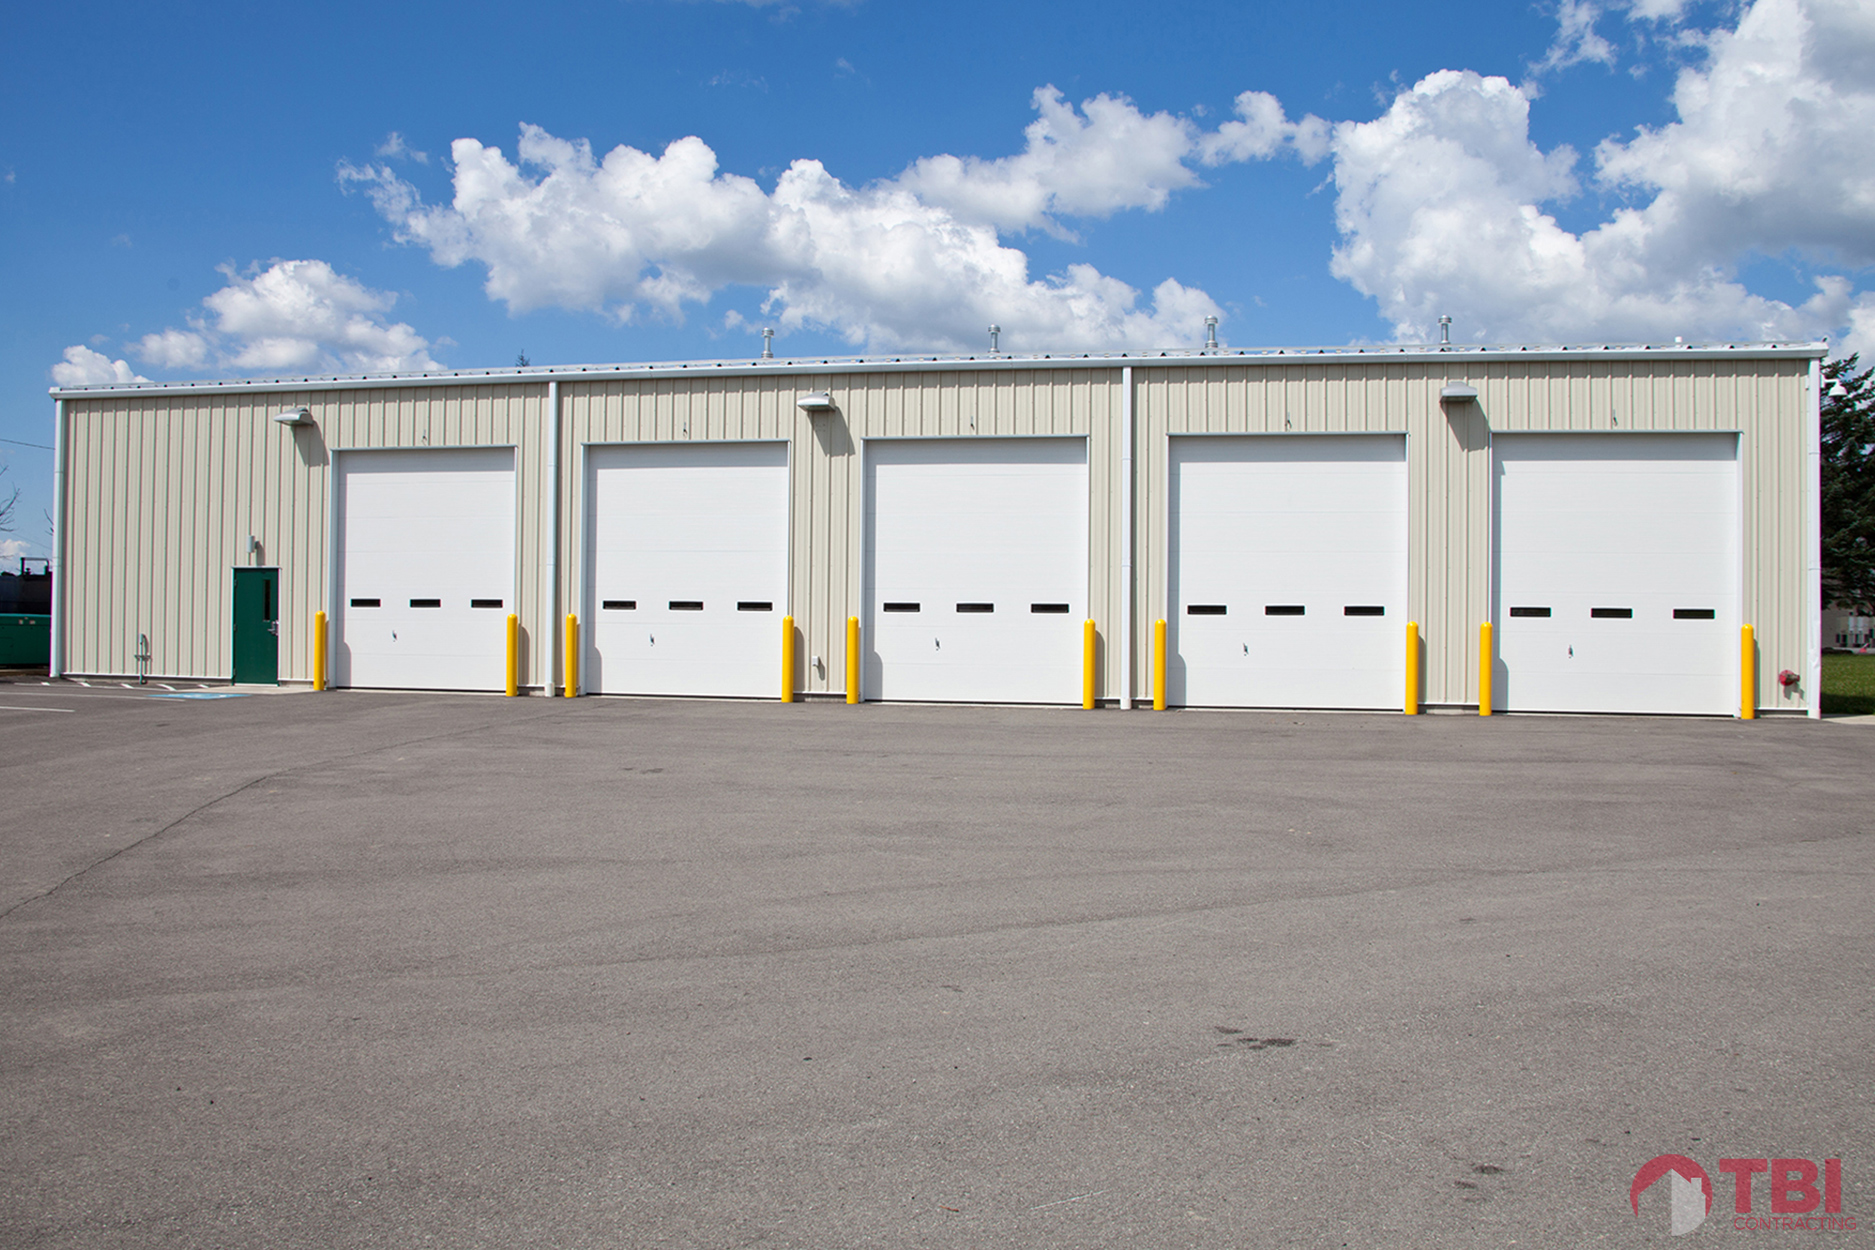 https://i0.wp.com/tbicontracting.com/wp-content/uploads/2015/05/north-park-equipment-garage-by-tbi-3.jpg?fit=1875%2C1250&ssl=1